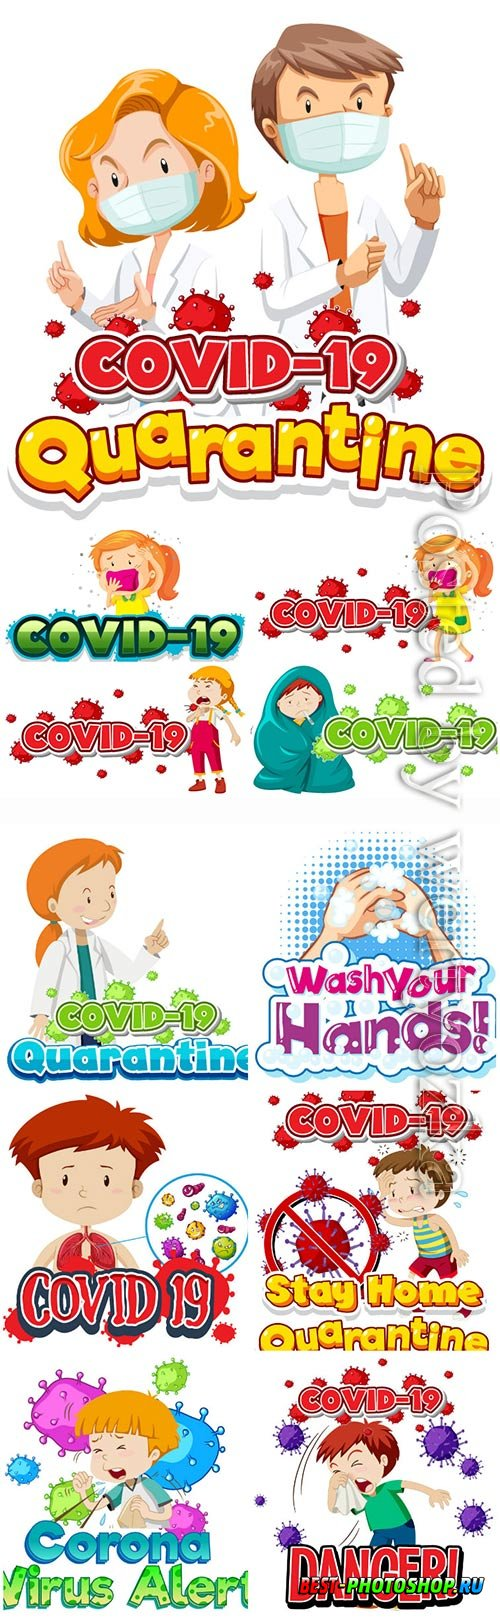 COVID 19, Coranavirus vector illustration sets # 17